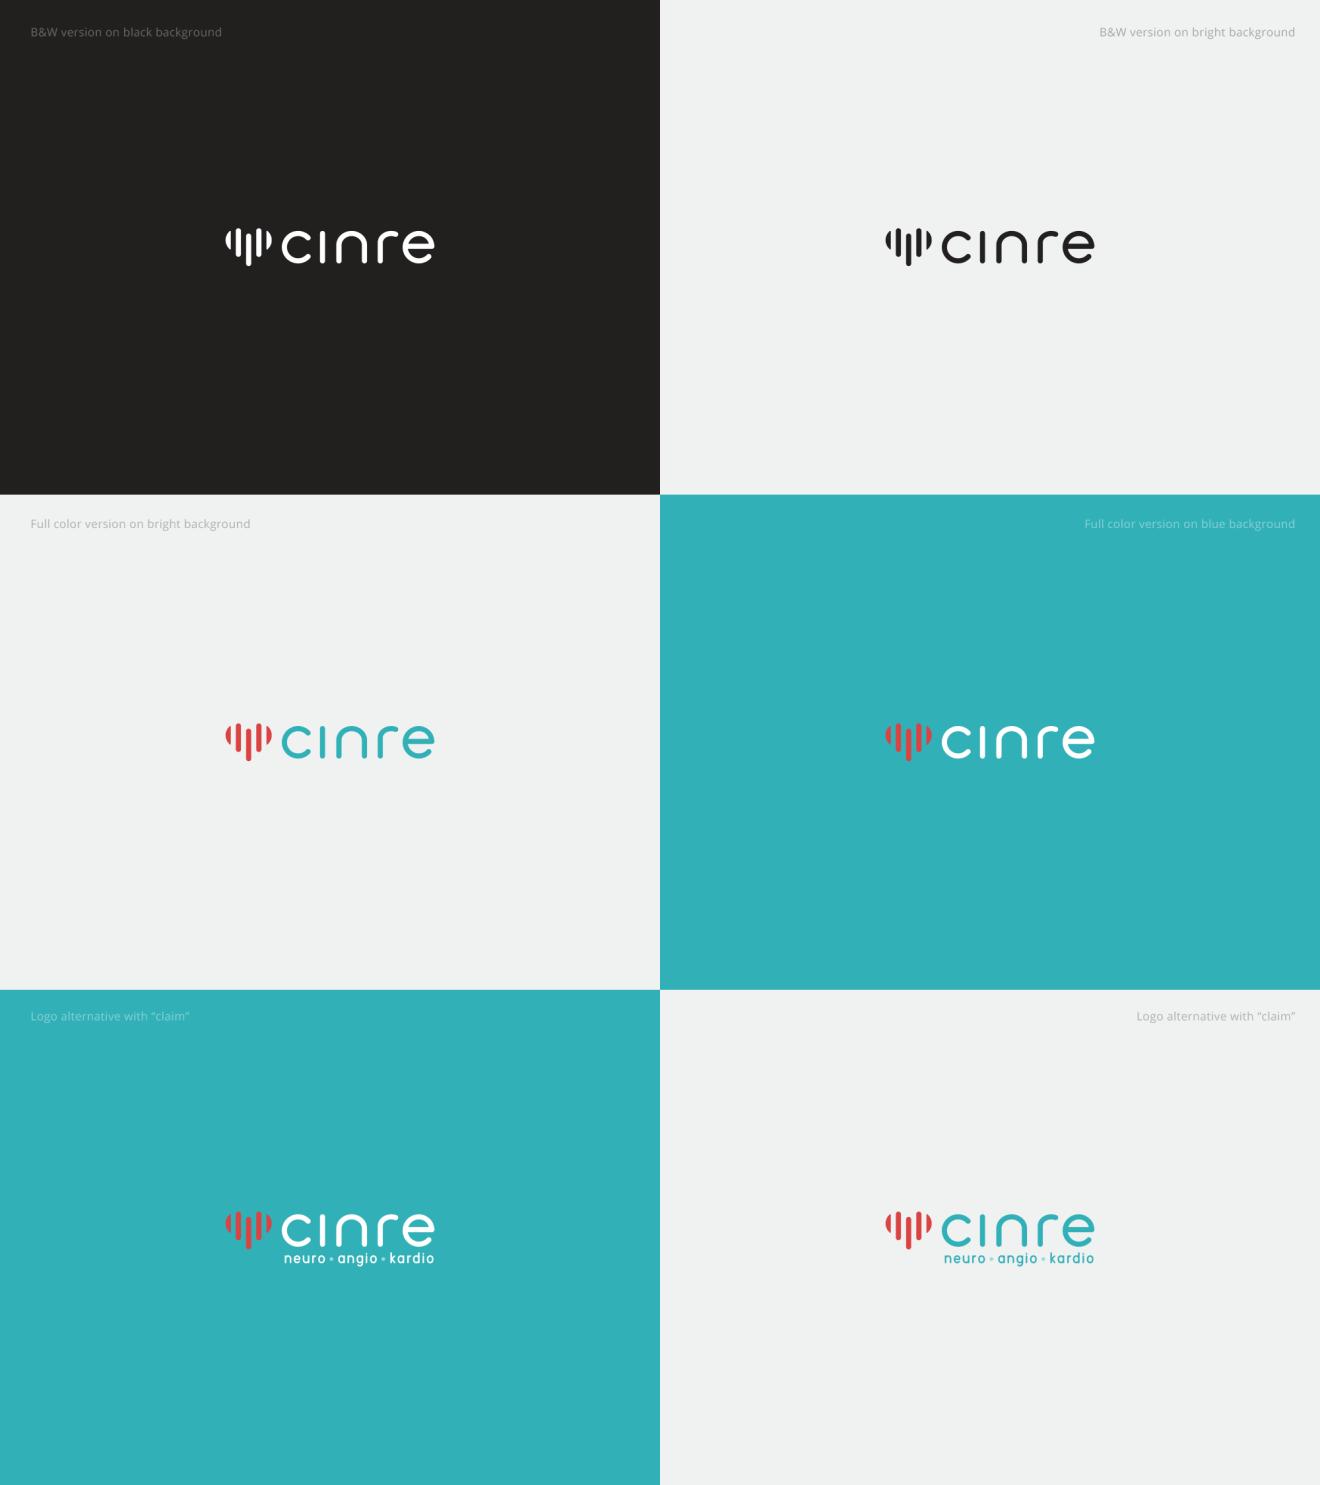 Cinre_logo_proposal_v1_03